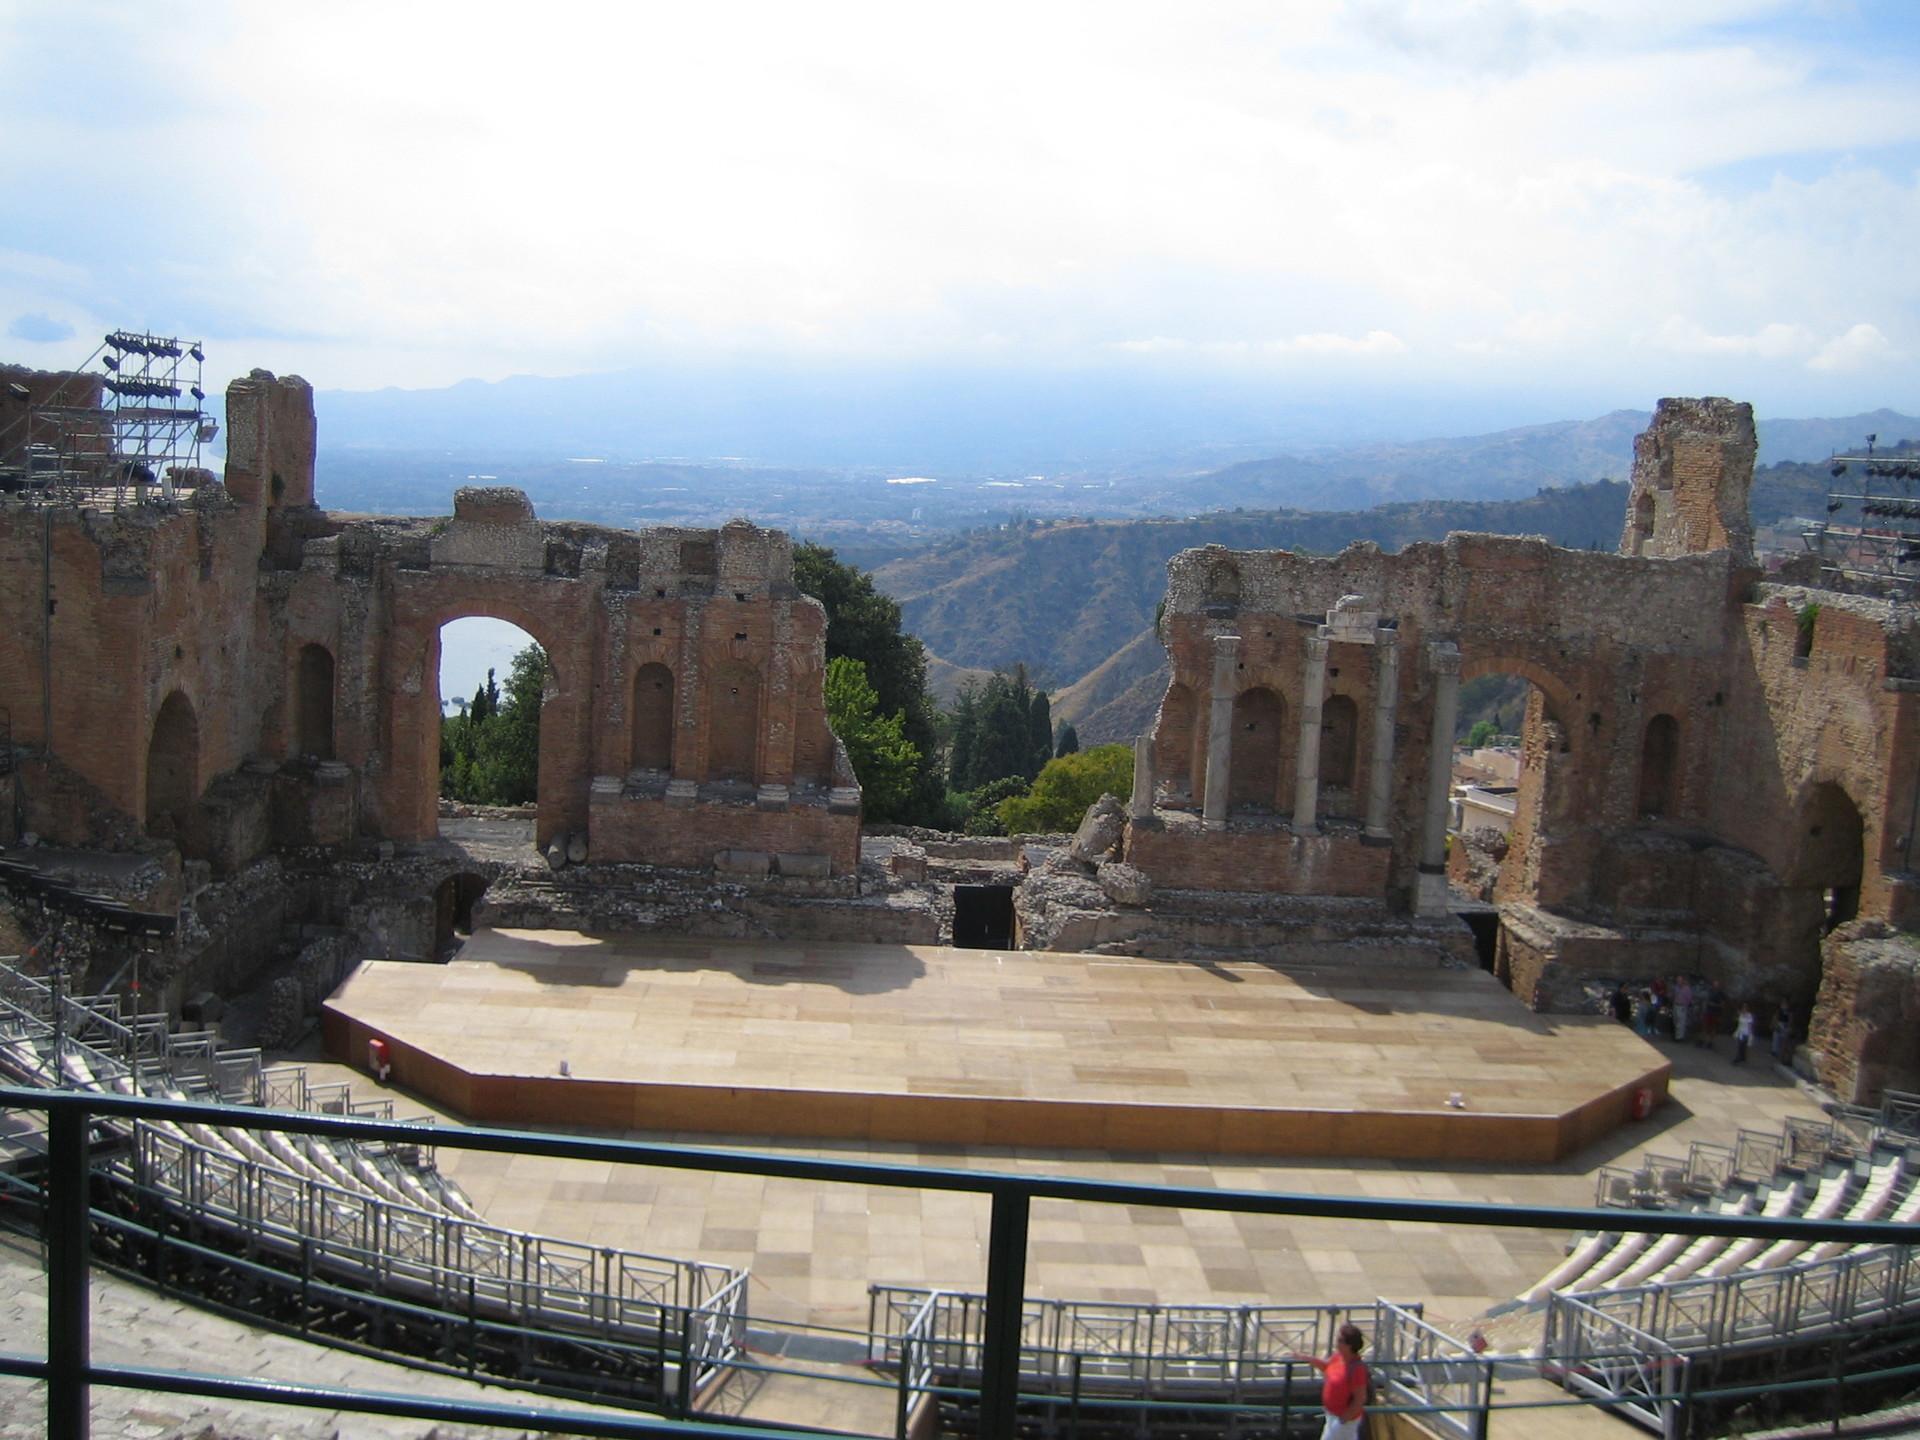 Taormina - Goethe was here!